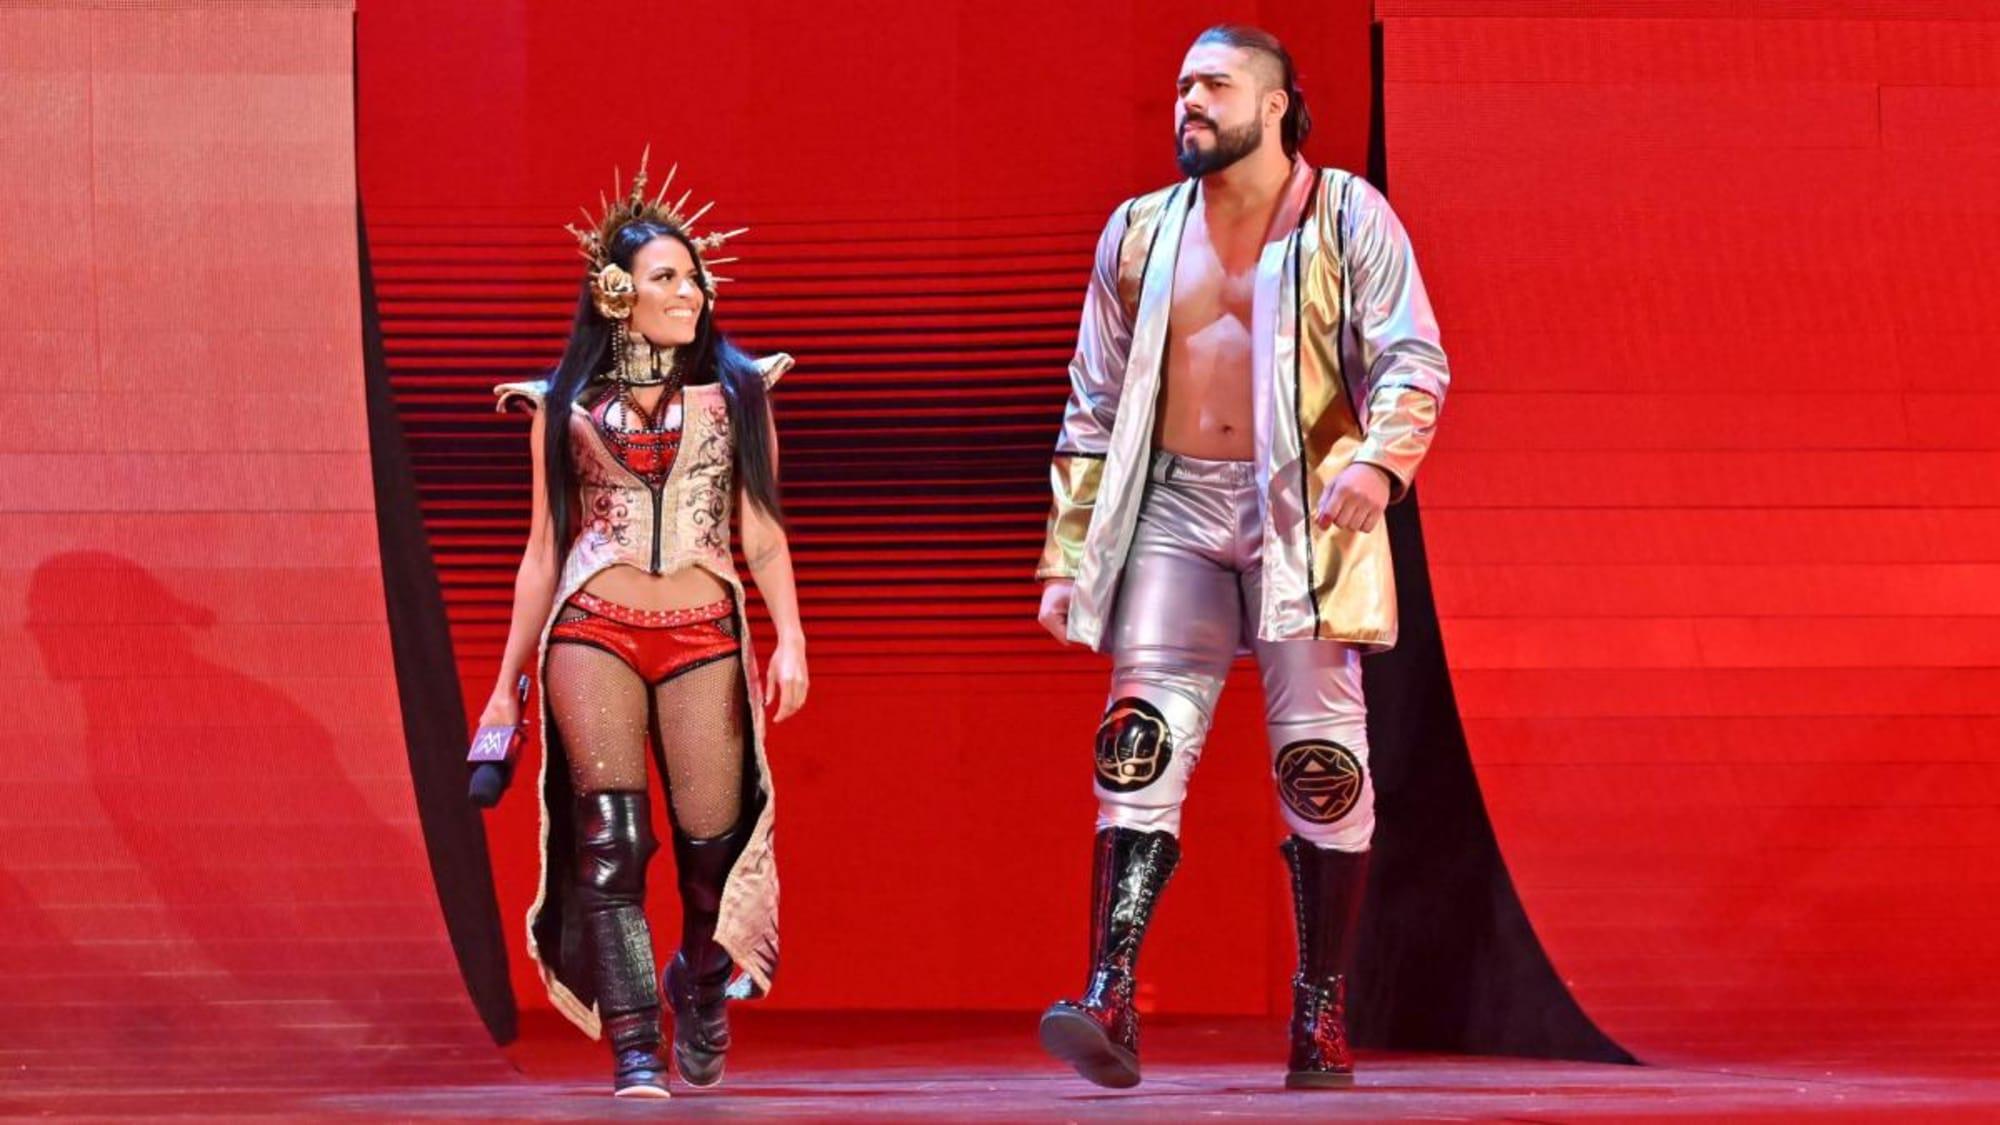 WWE: Zelina Vega has huge support from Vince McMahon, Paul Heyman